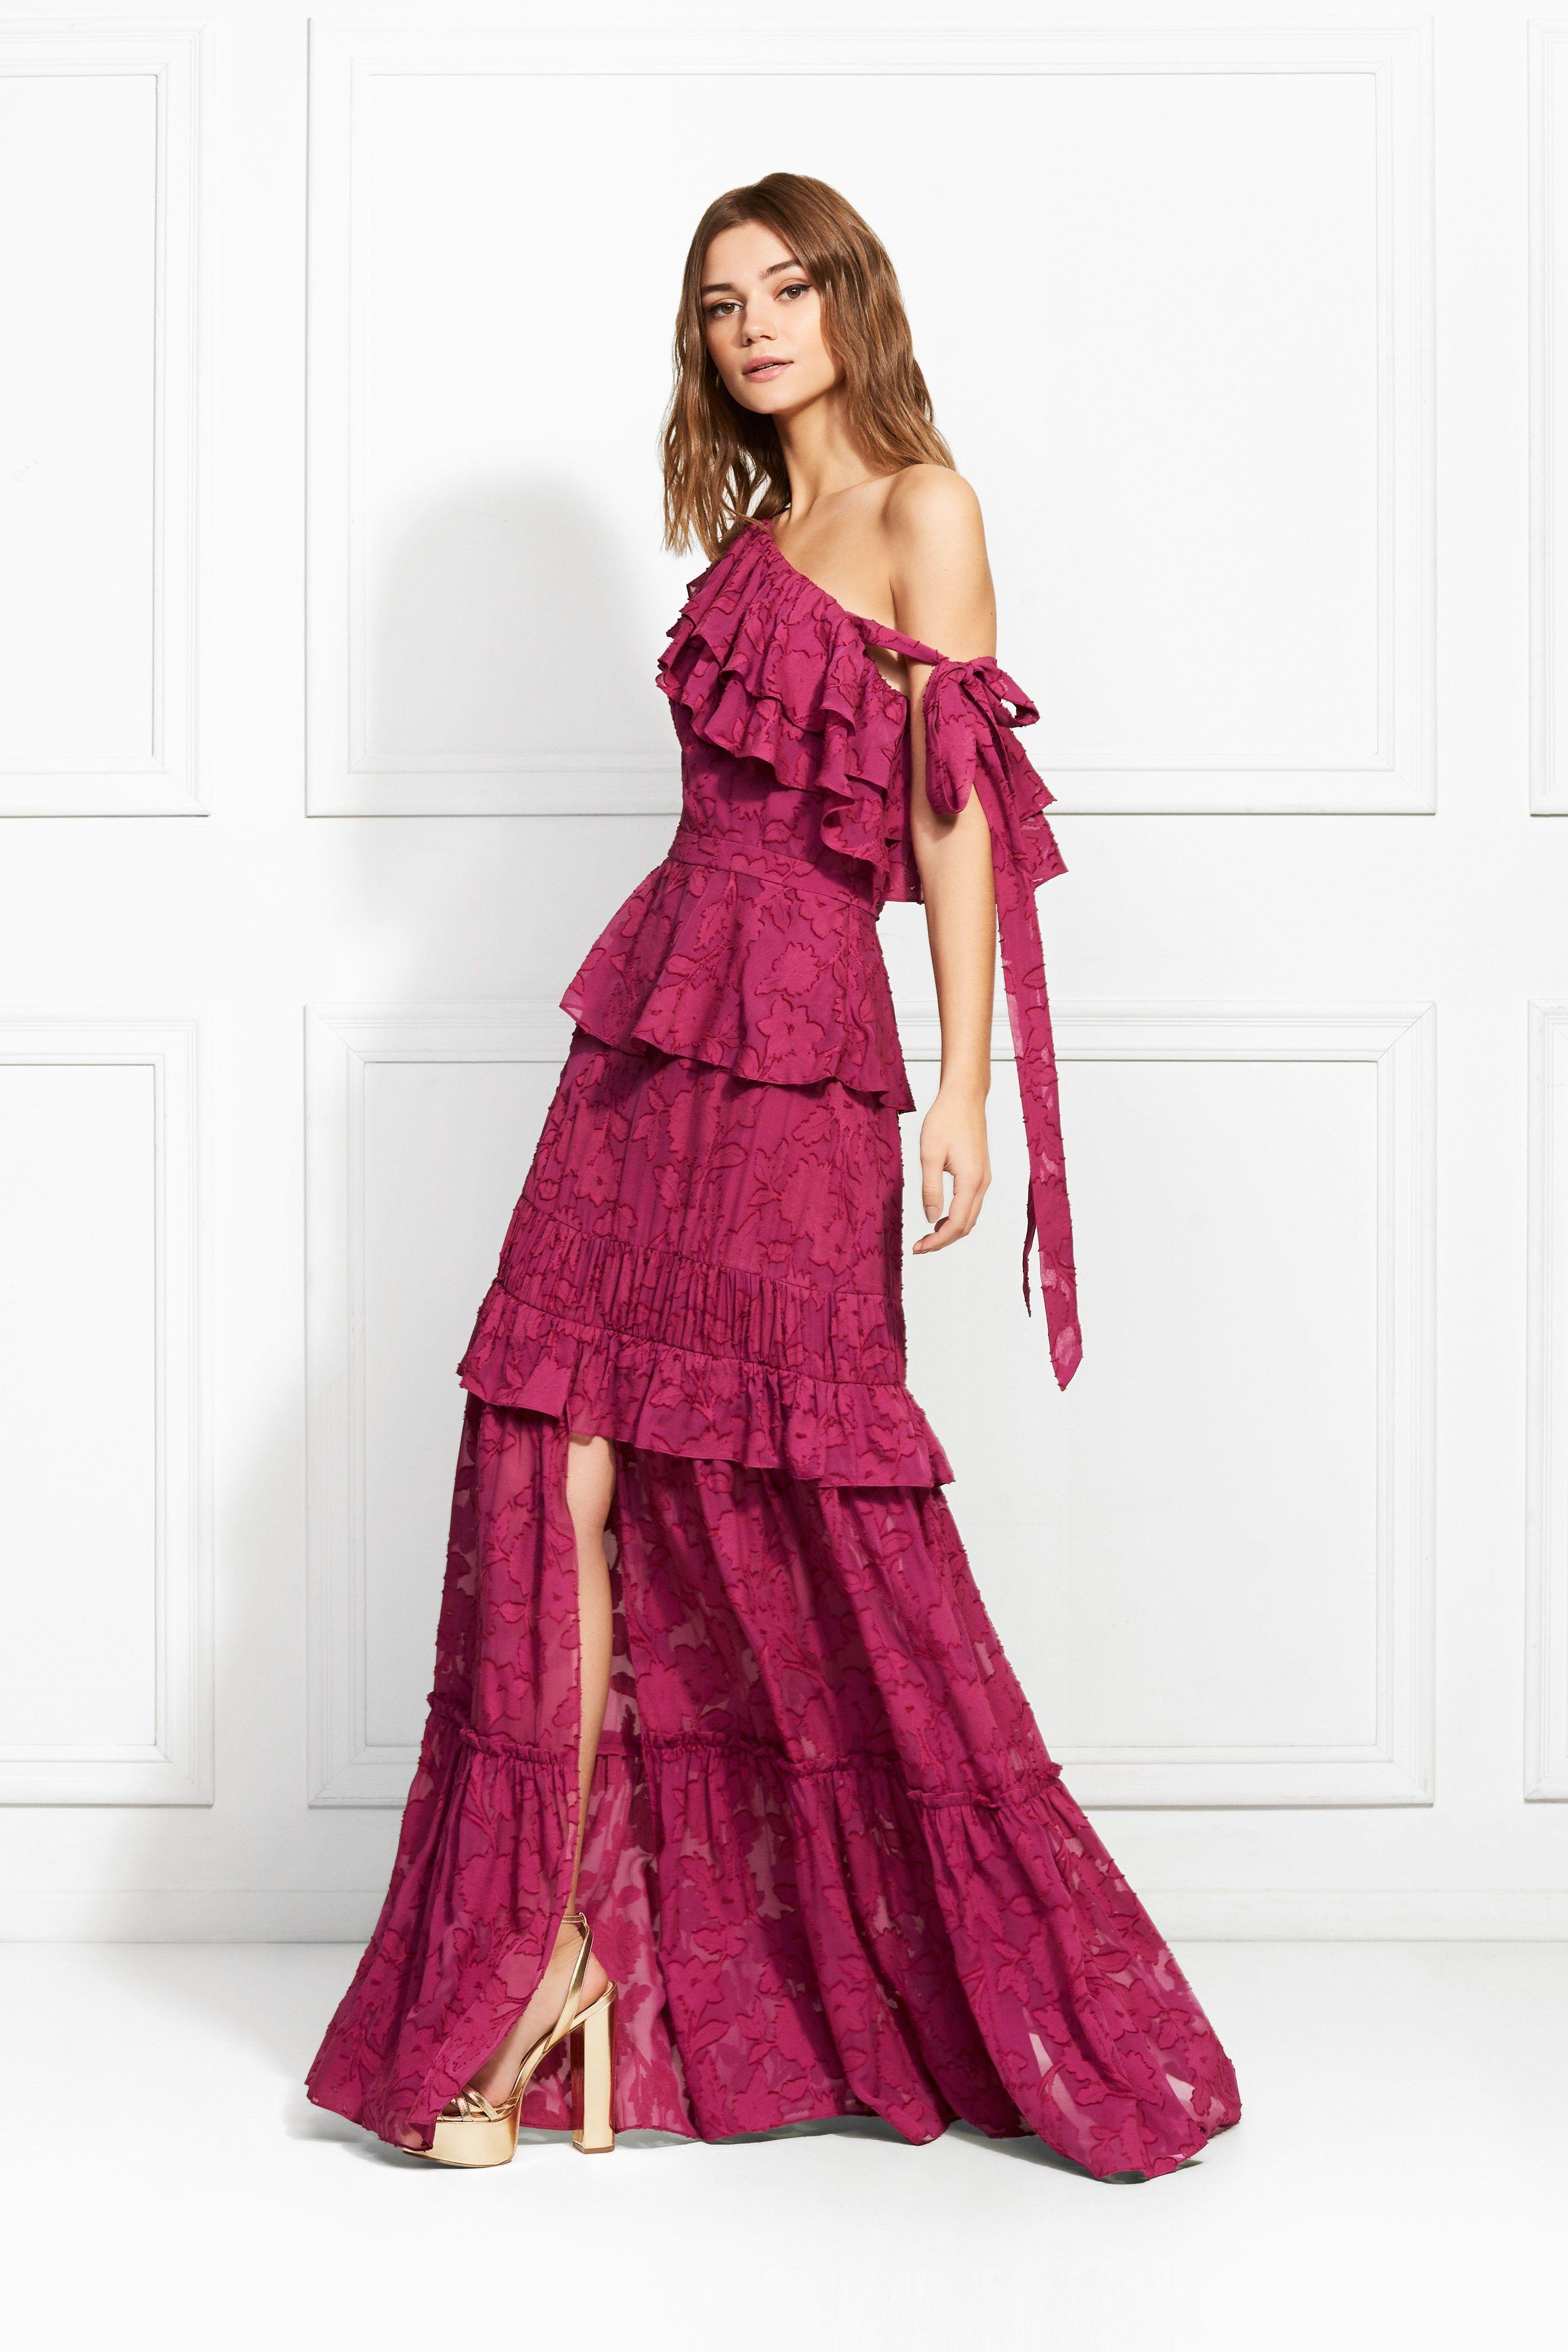 63b74d72f9 Rachel Zoe Pre-Fall 2019 Fashion Show in 2018